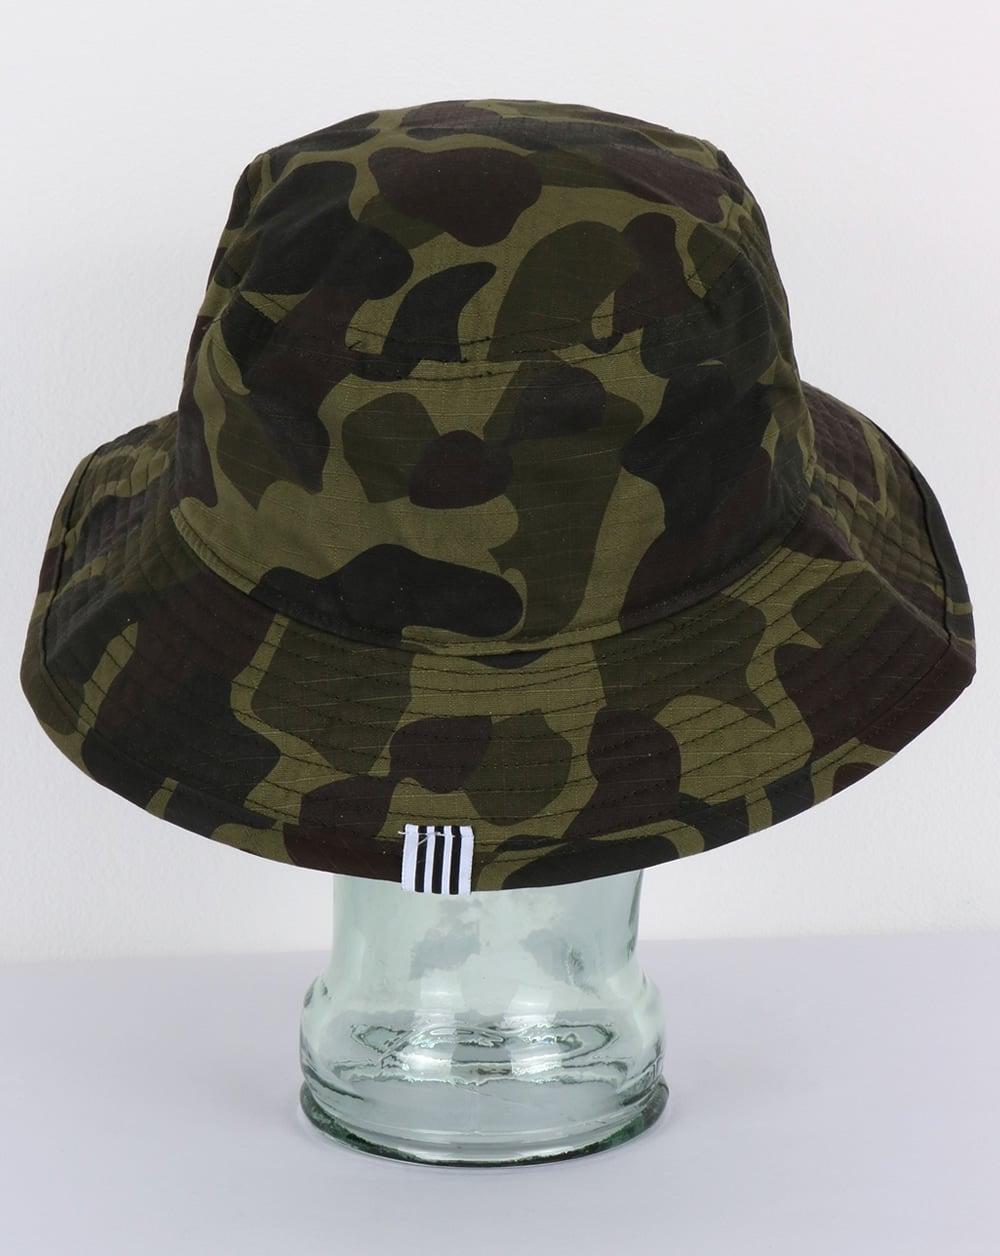 afdc8753d0fcd Adidas Originals Bucket Hat Camo